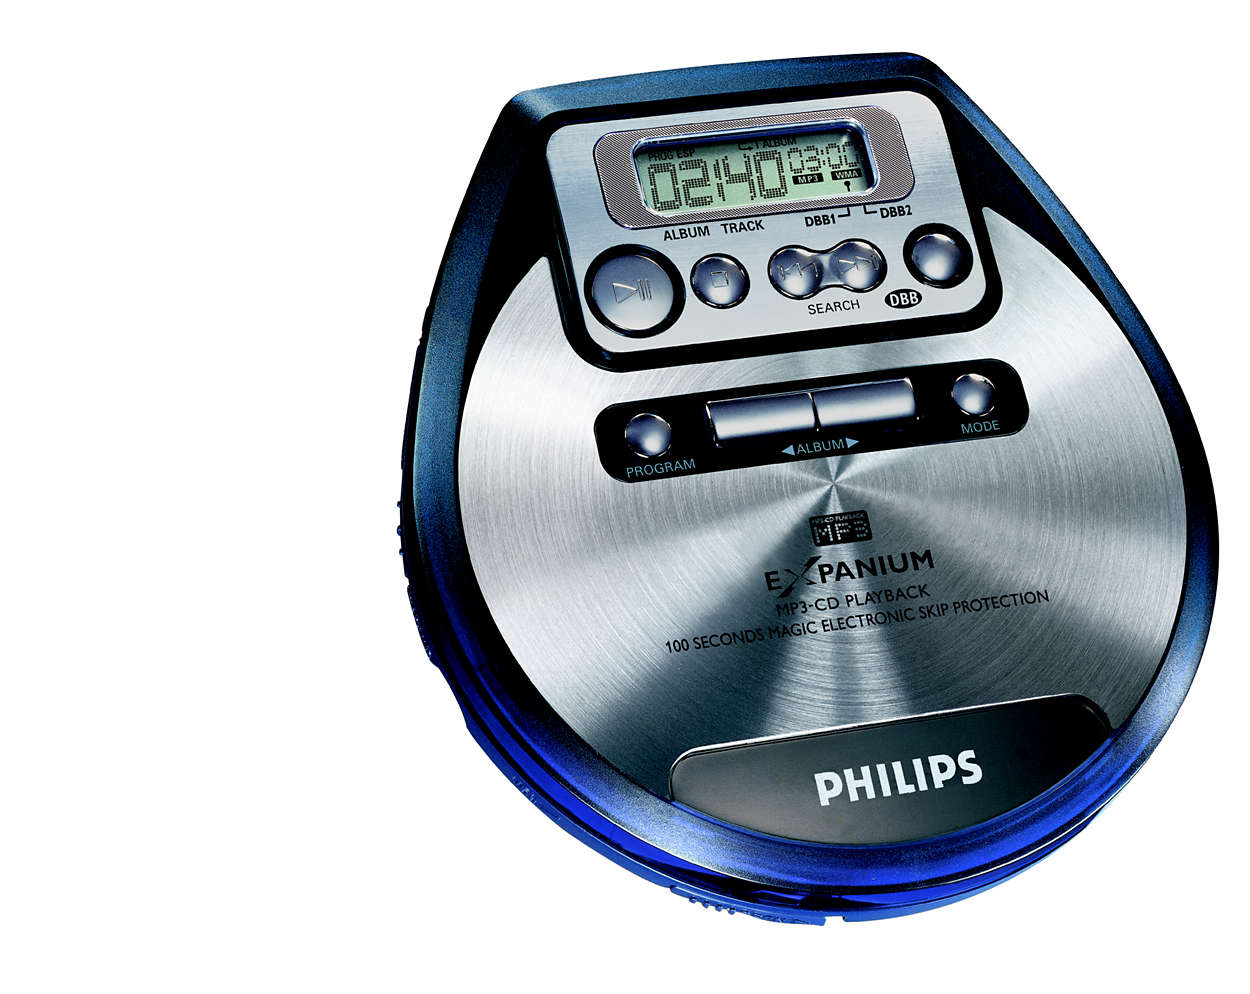 portable cd player exp220 01 philips. Black Bedroom Furniture Sets. Home Design Ideas